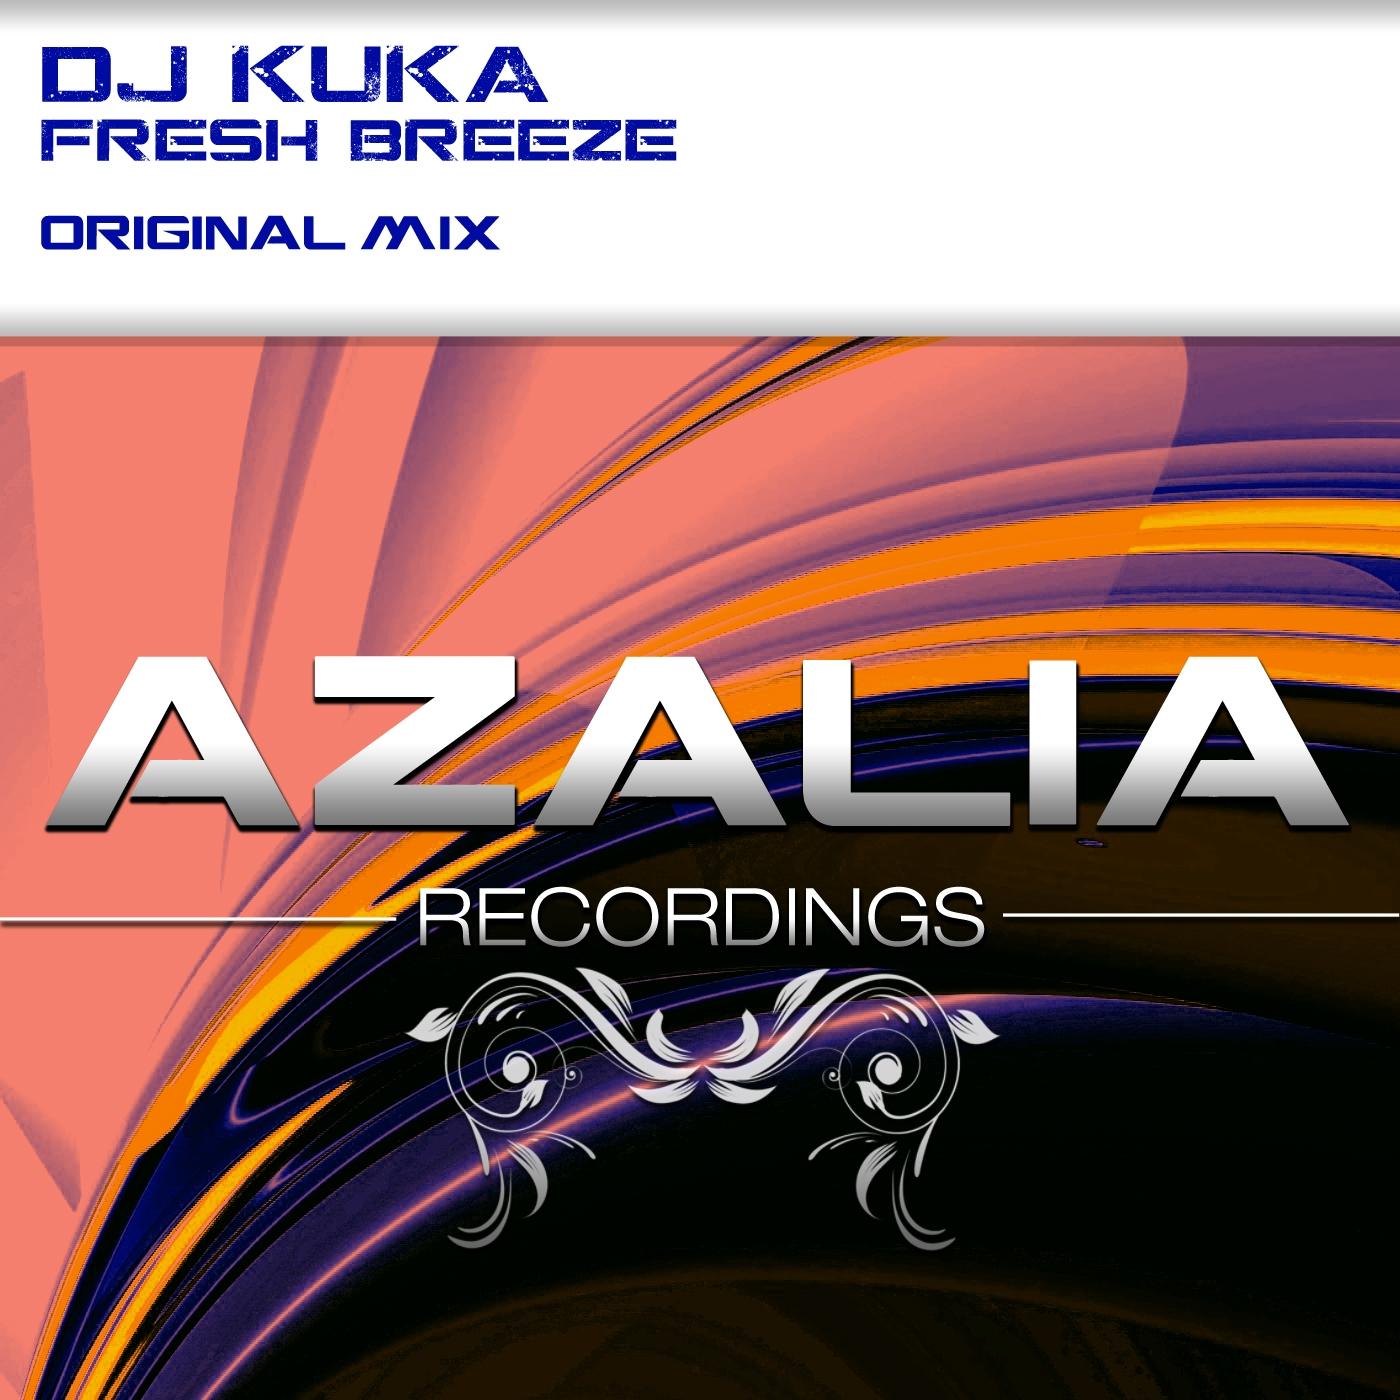 Dj Kuka - Fresh Breeze (Original Mix)